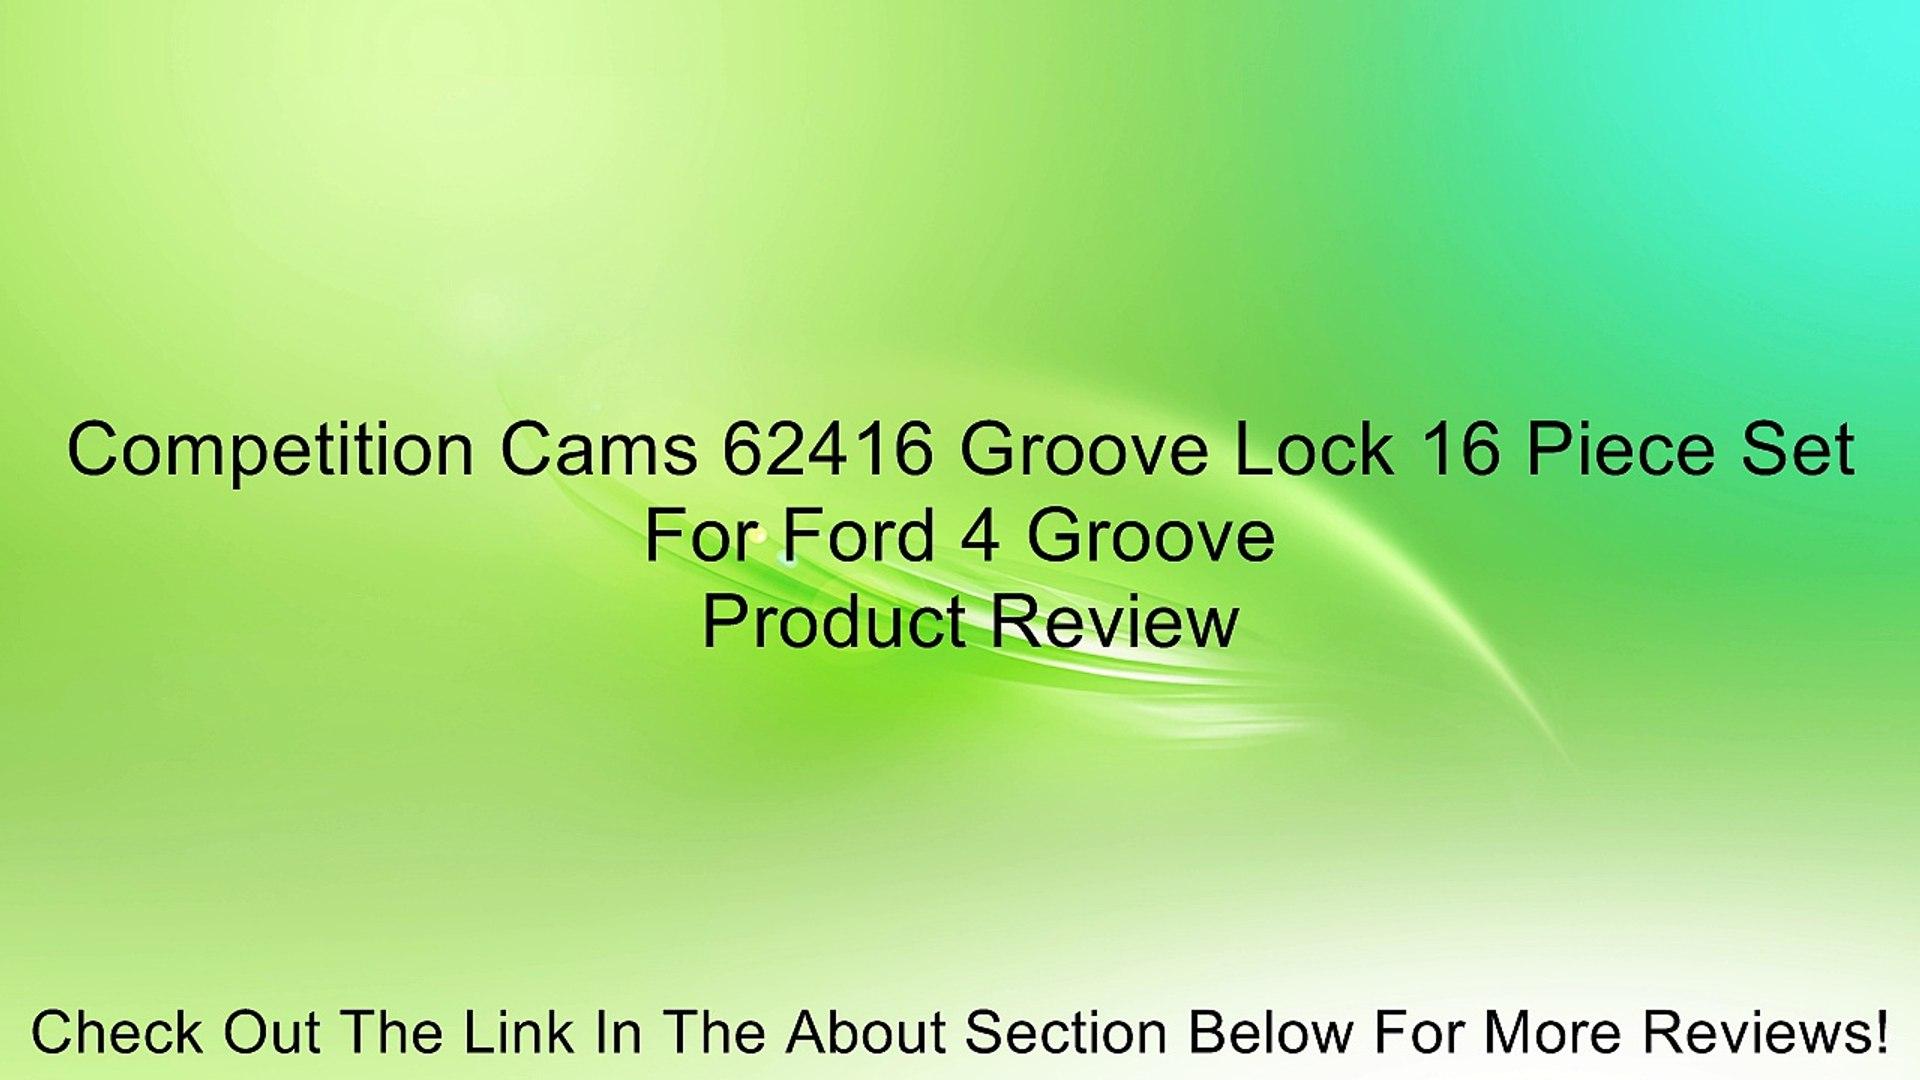 Competition Cams 60516 Valve Locks /& Lash Caps 16 Piece Set For Ford 4-Groove 11//32 Diam Stem